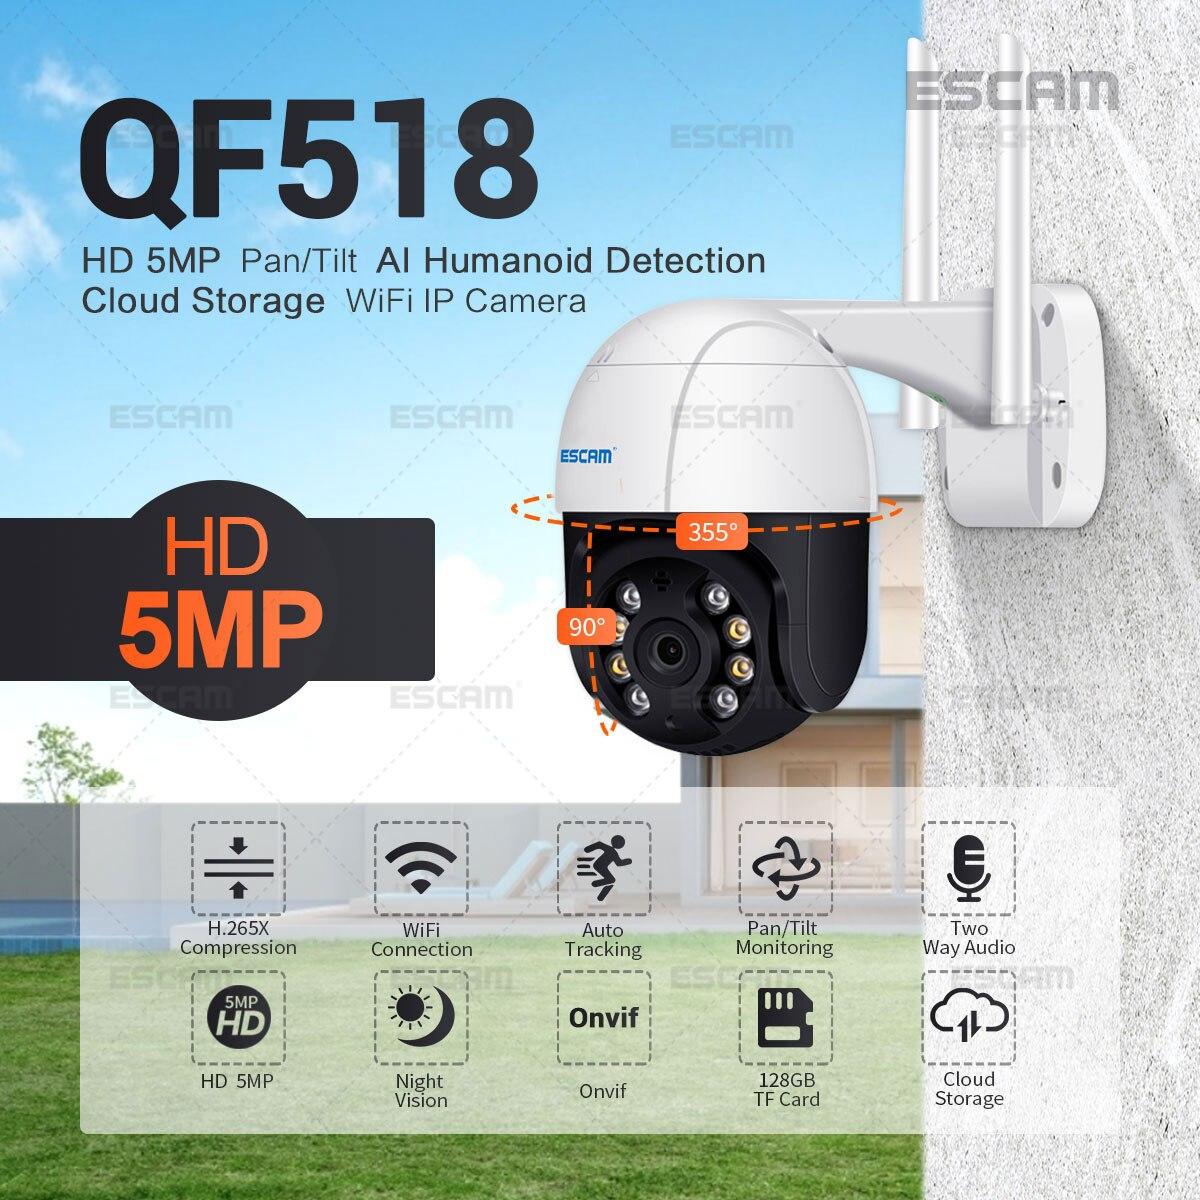 ESCAM-كاميرا IP QF518 بدقة 5 ميجابكسل (QF518) ، مع كشف بشري AI ، تتبع تلقائي ، تخزين سحابي ، WiFi ، رؤية ليلية صوتية ثنائية الاتجاه